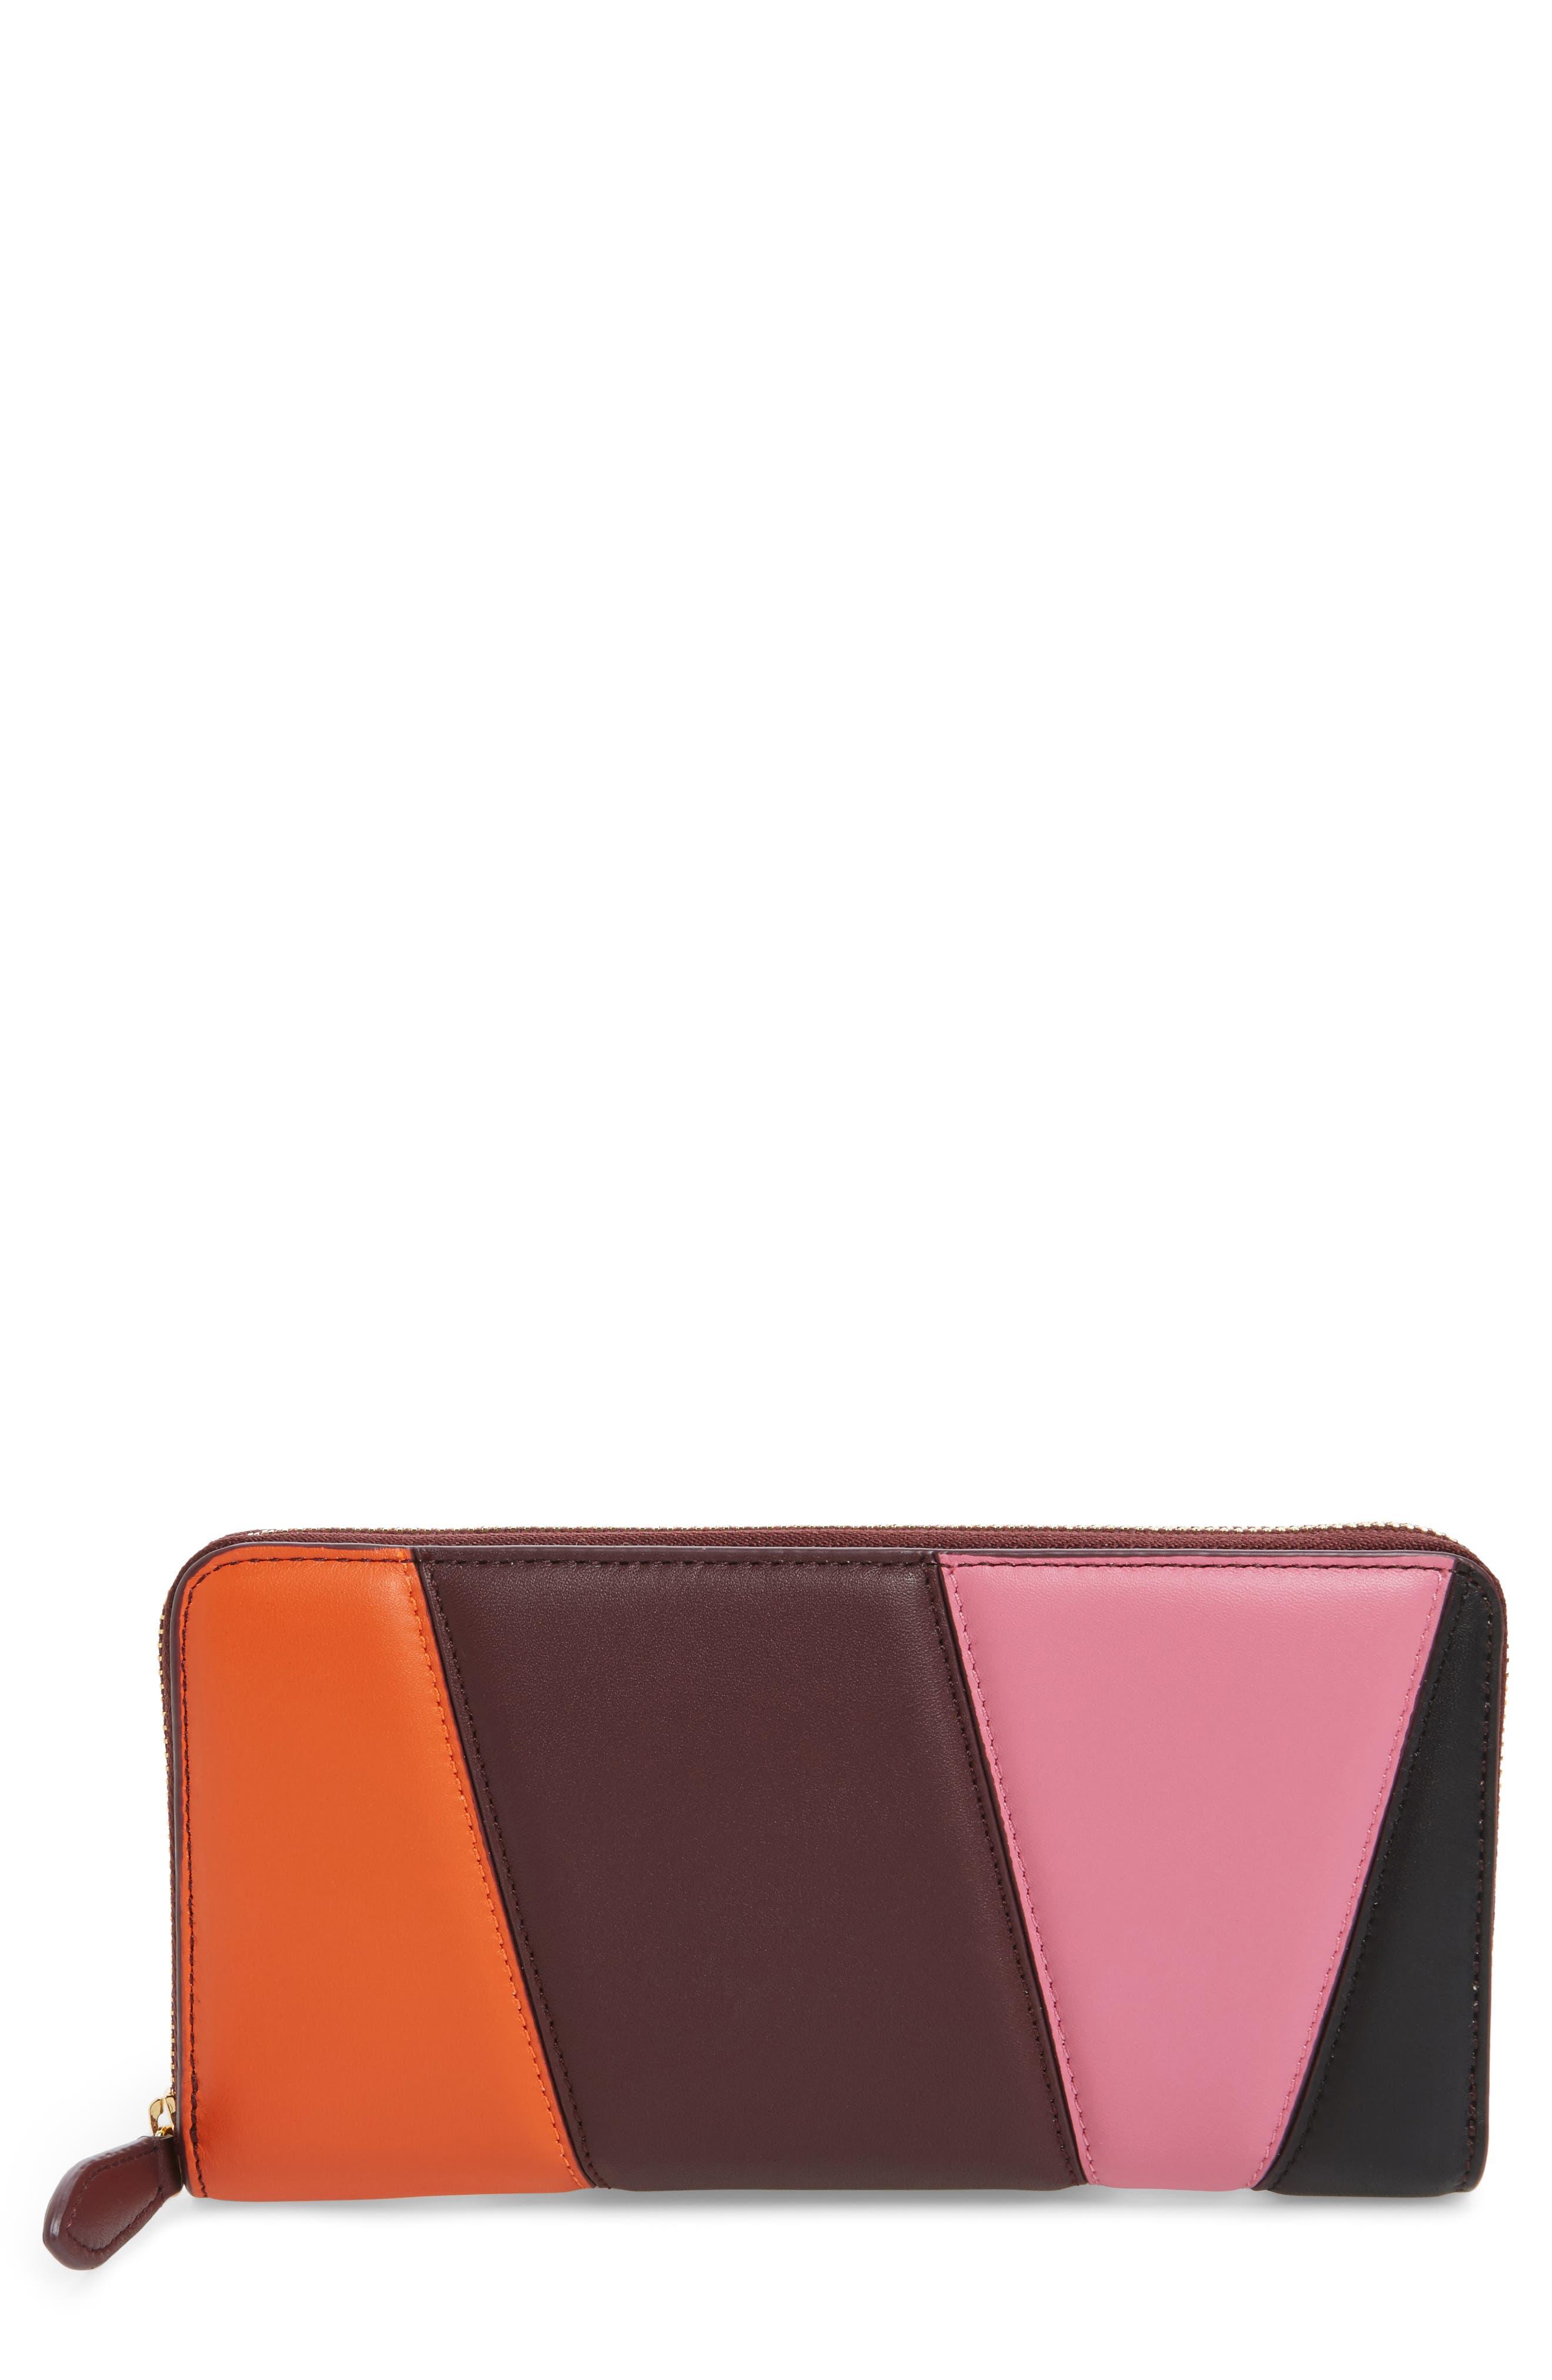 Main Image - Diane von Furstenberg Colorblock Leather Continental Wallet